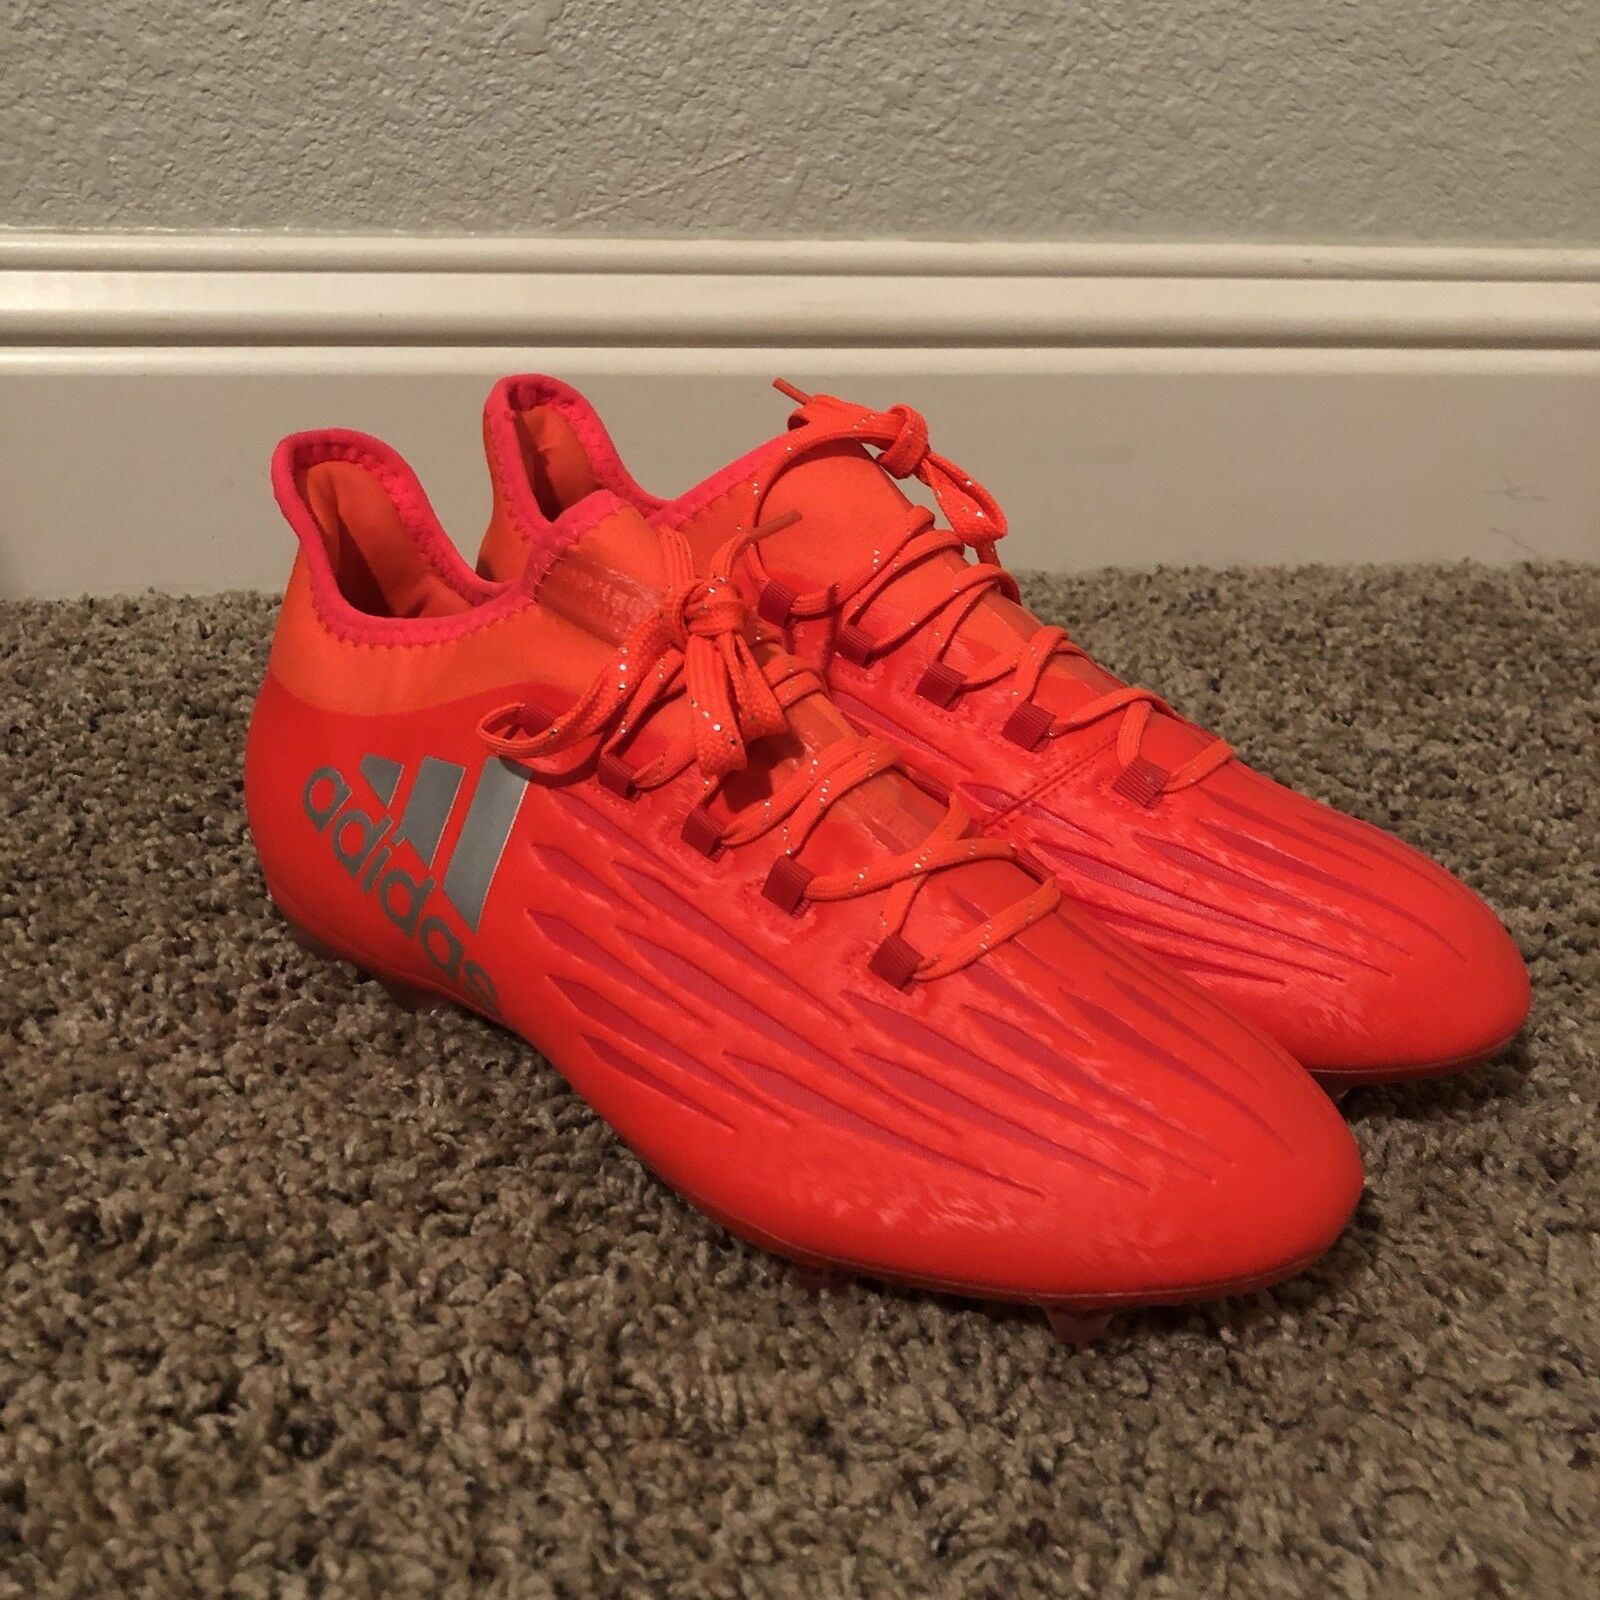 Adidas X 16.2 FG Solar orange Soccer Cleats  S79538 Size 9.5